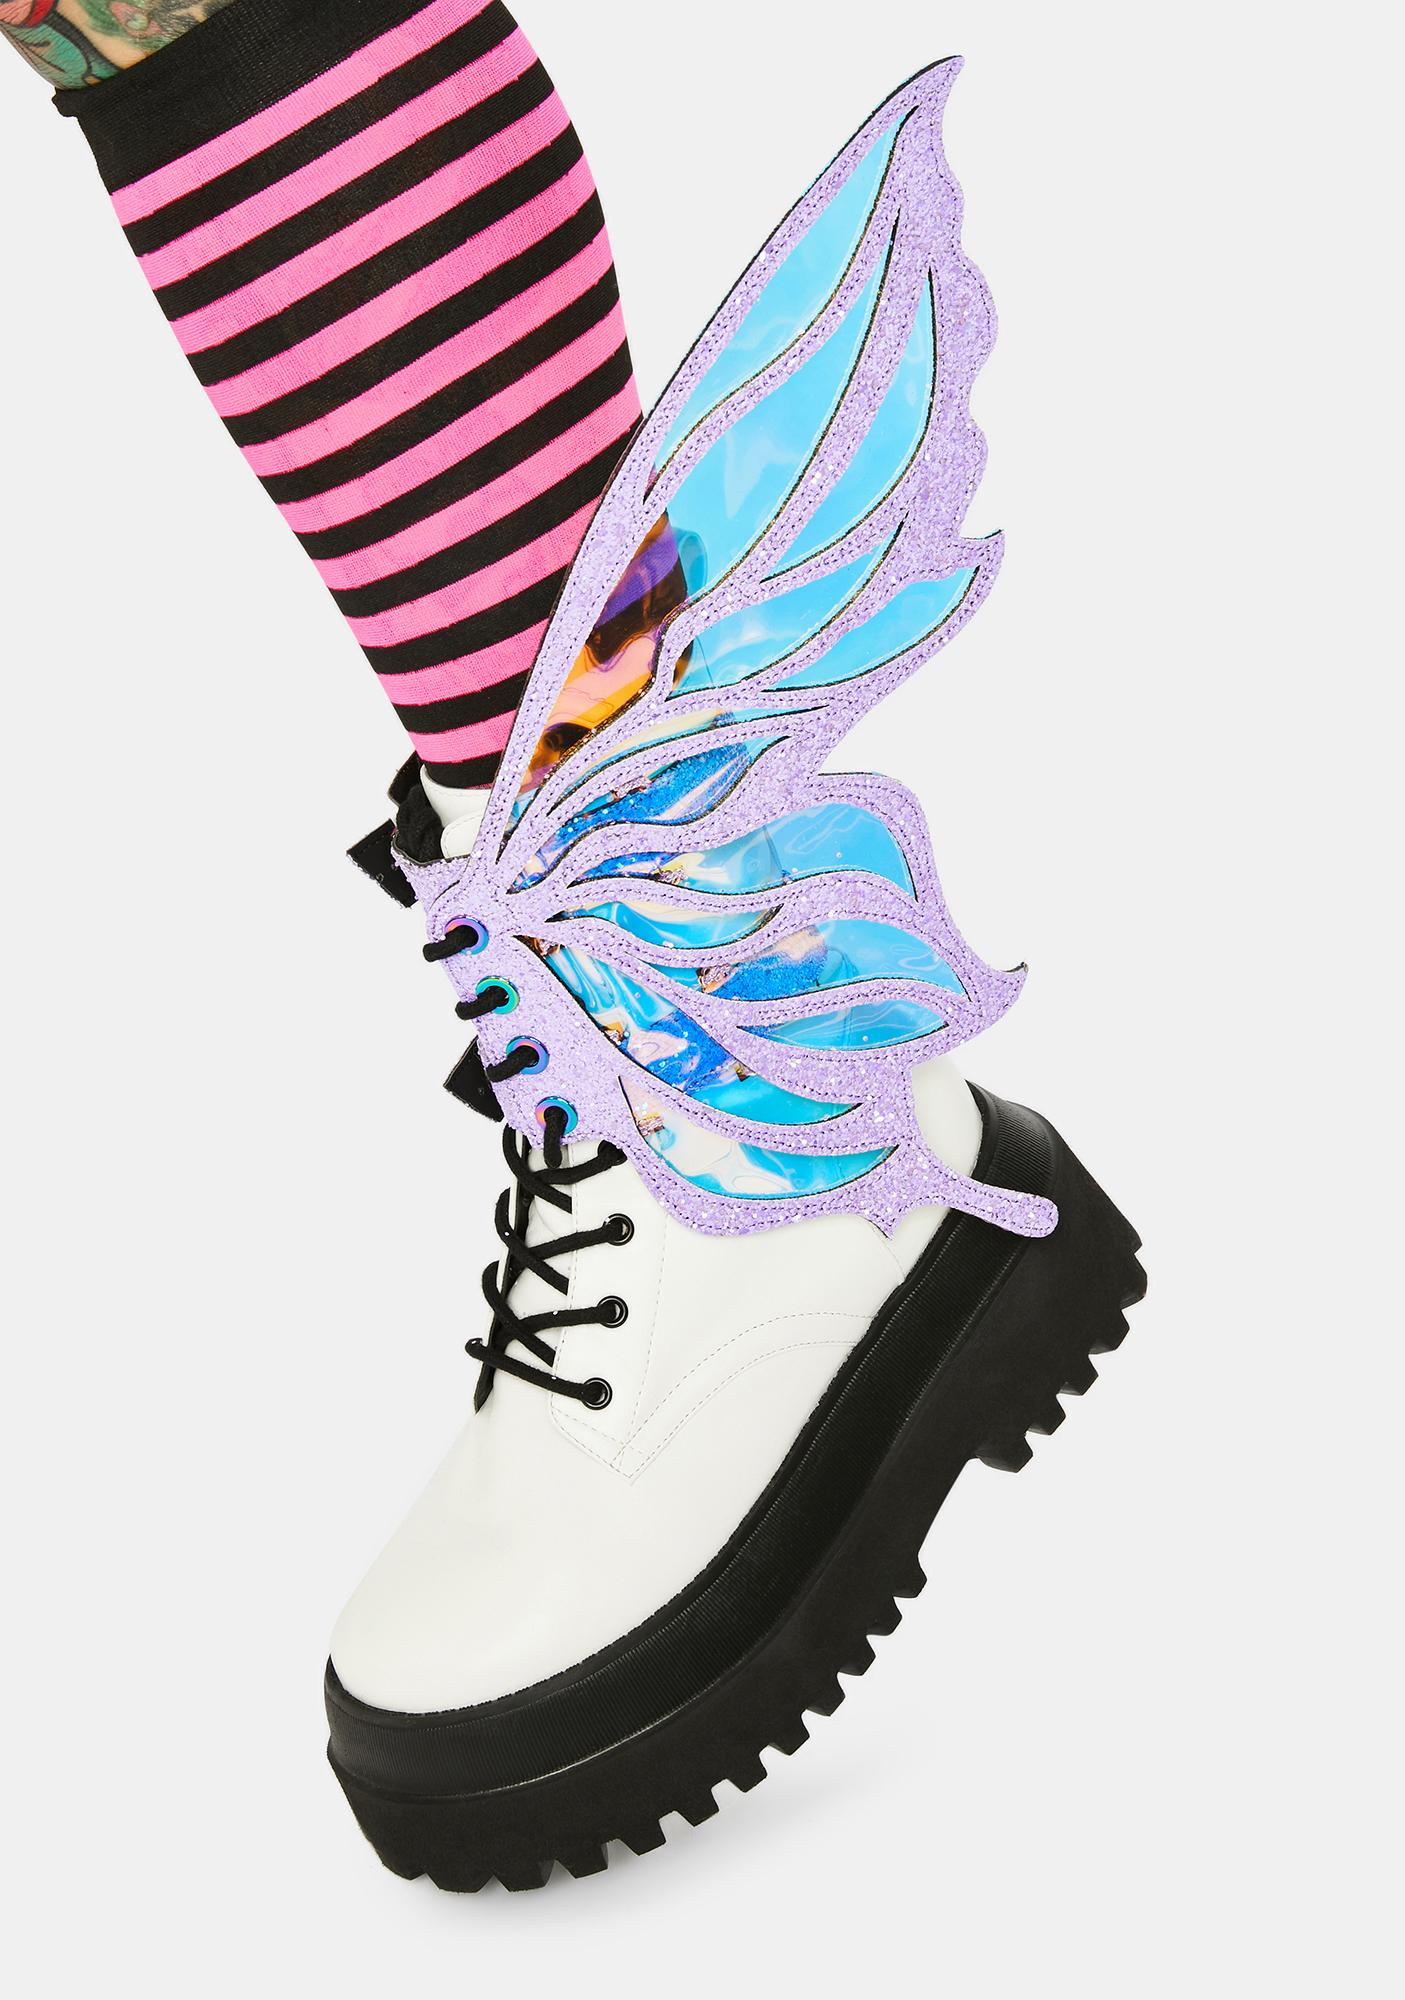 Neva Nude Pink Feyre Glitter Fairy Shoe Wingz